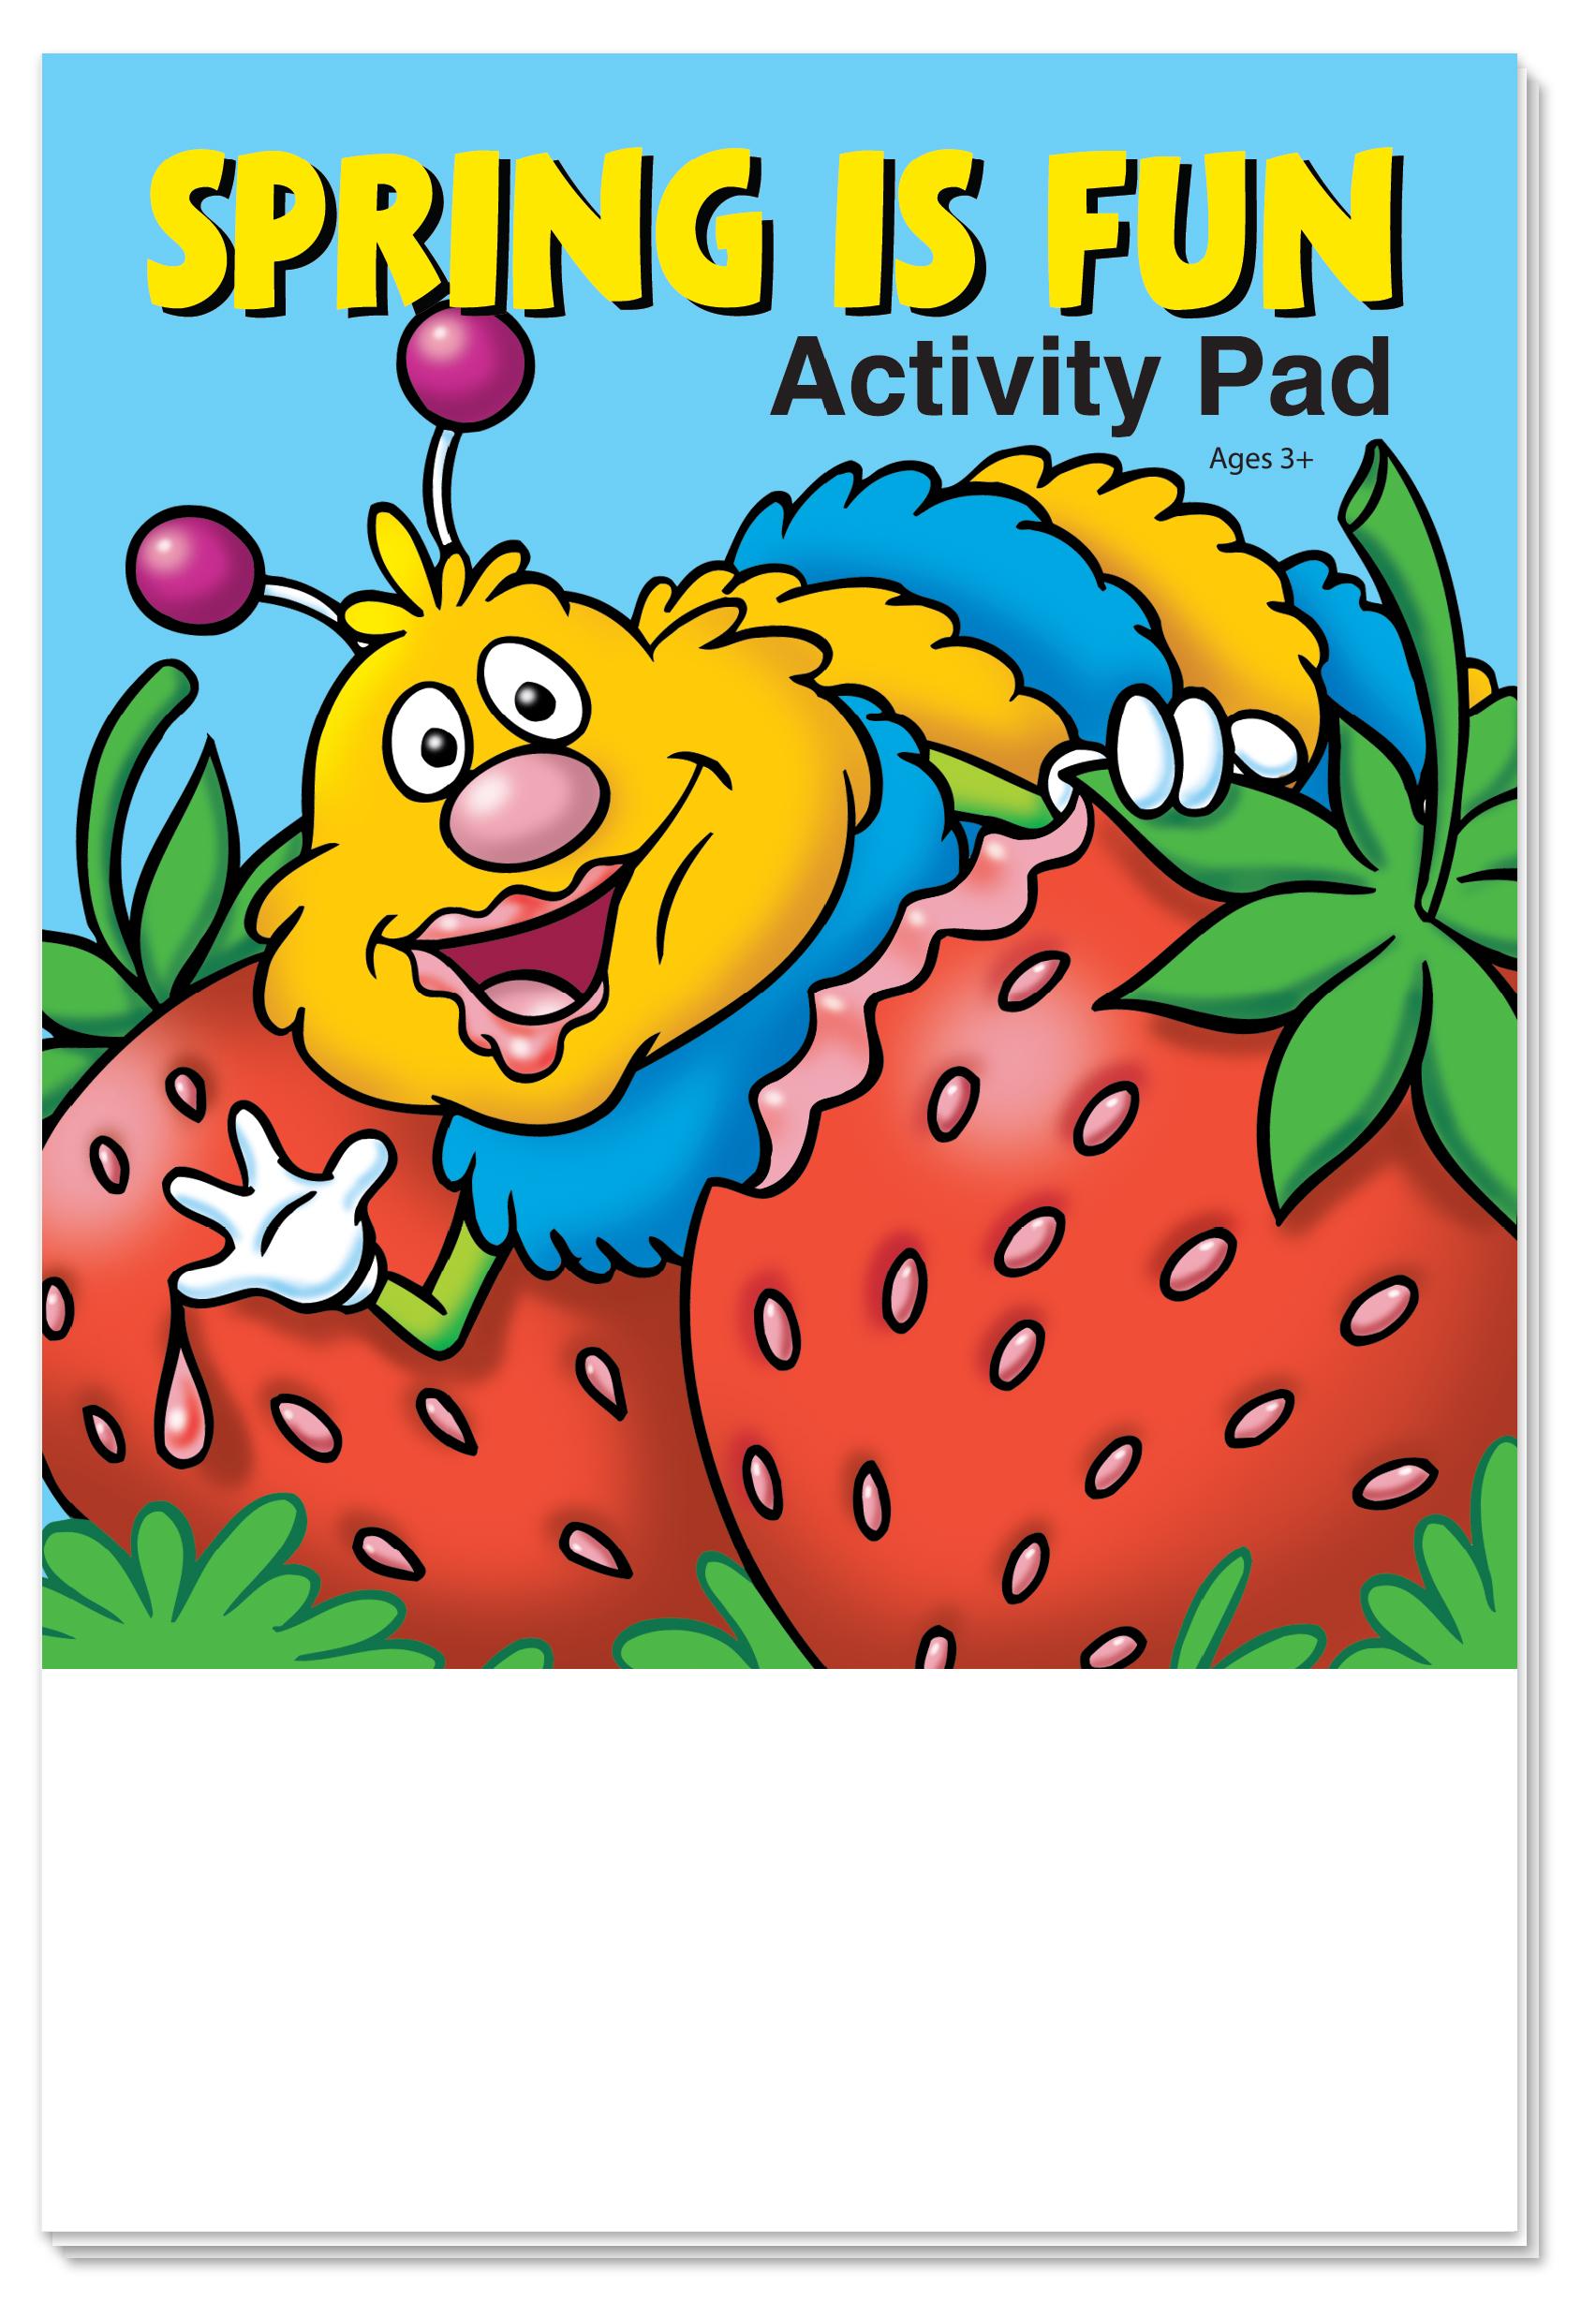 ACTIVITY PAD - Spring is Fun Activity Pad